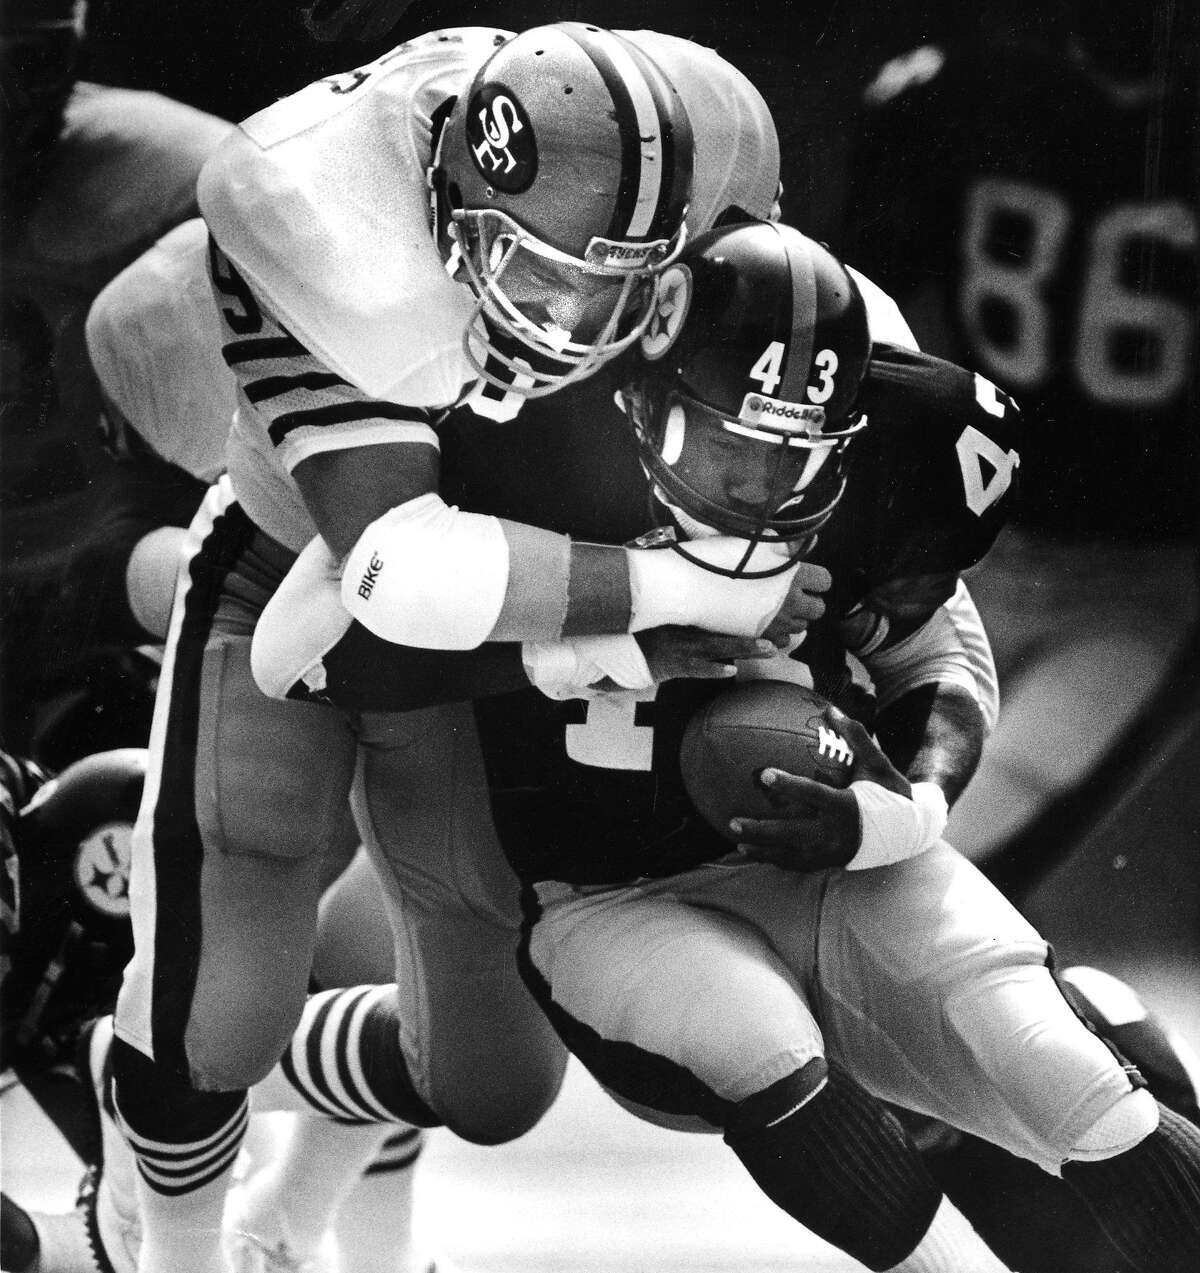 San Francisco 49ers defender Michael Walter tackles Ernest Jackson of the Pittsburgh Steelers September 13, 1987